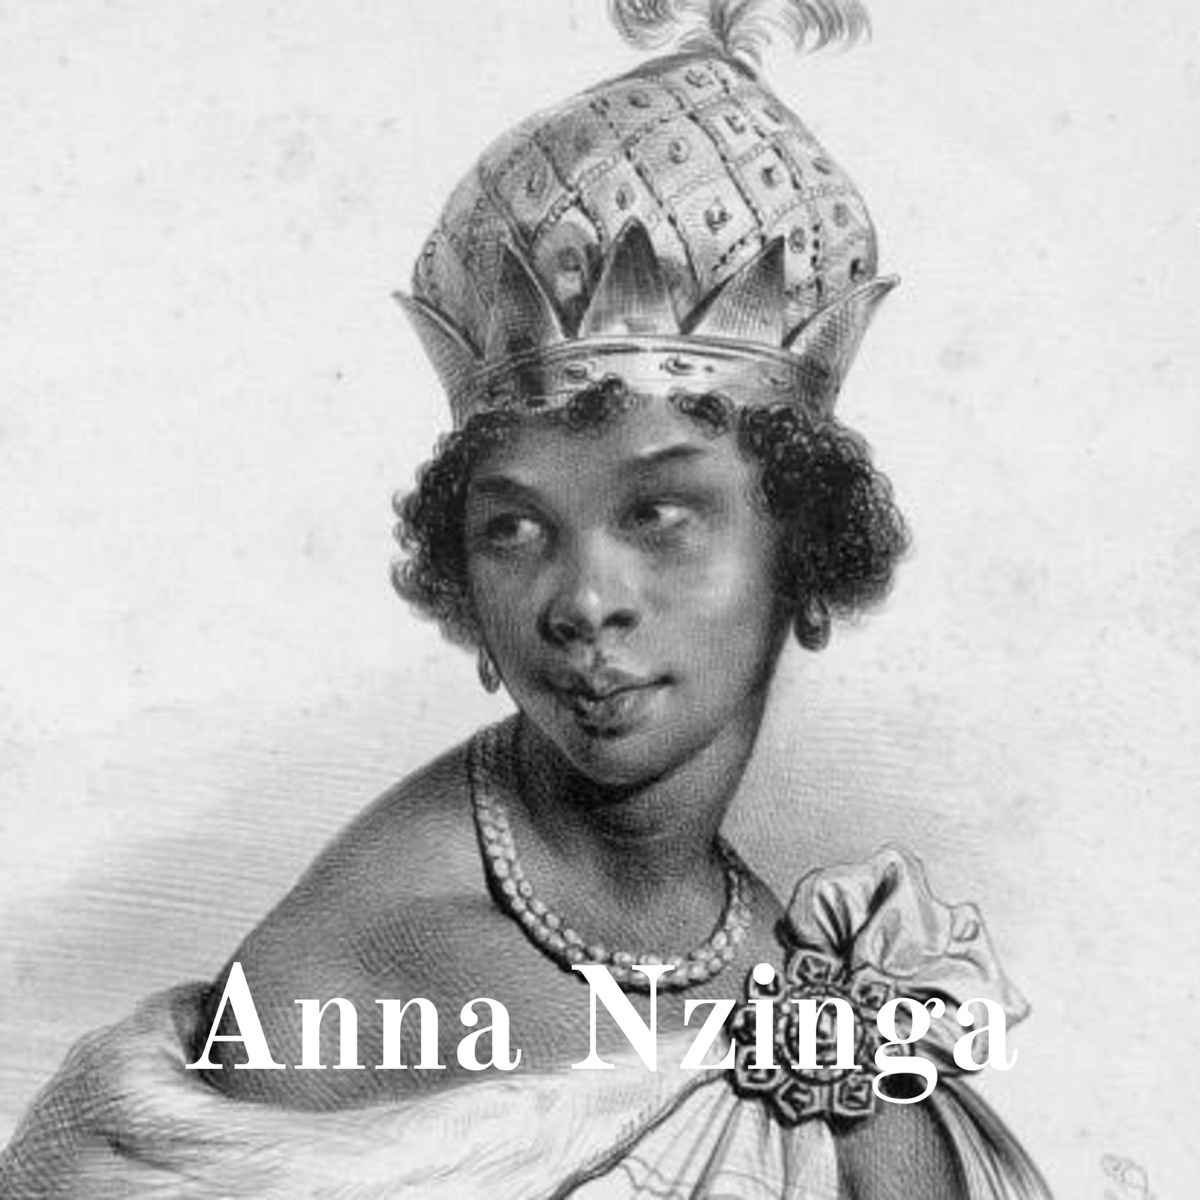 Anna Nzinga: The African Warrior Queen